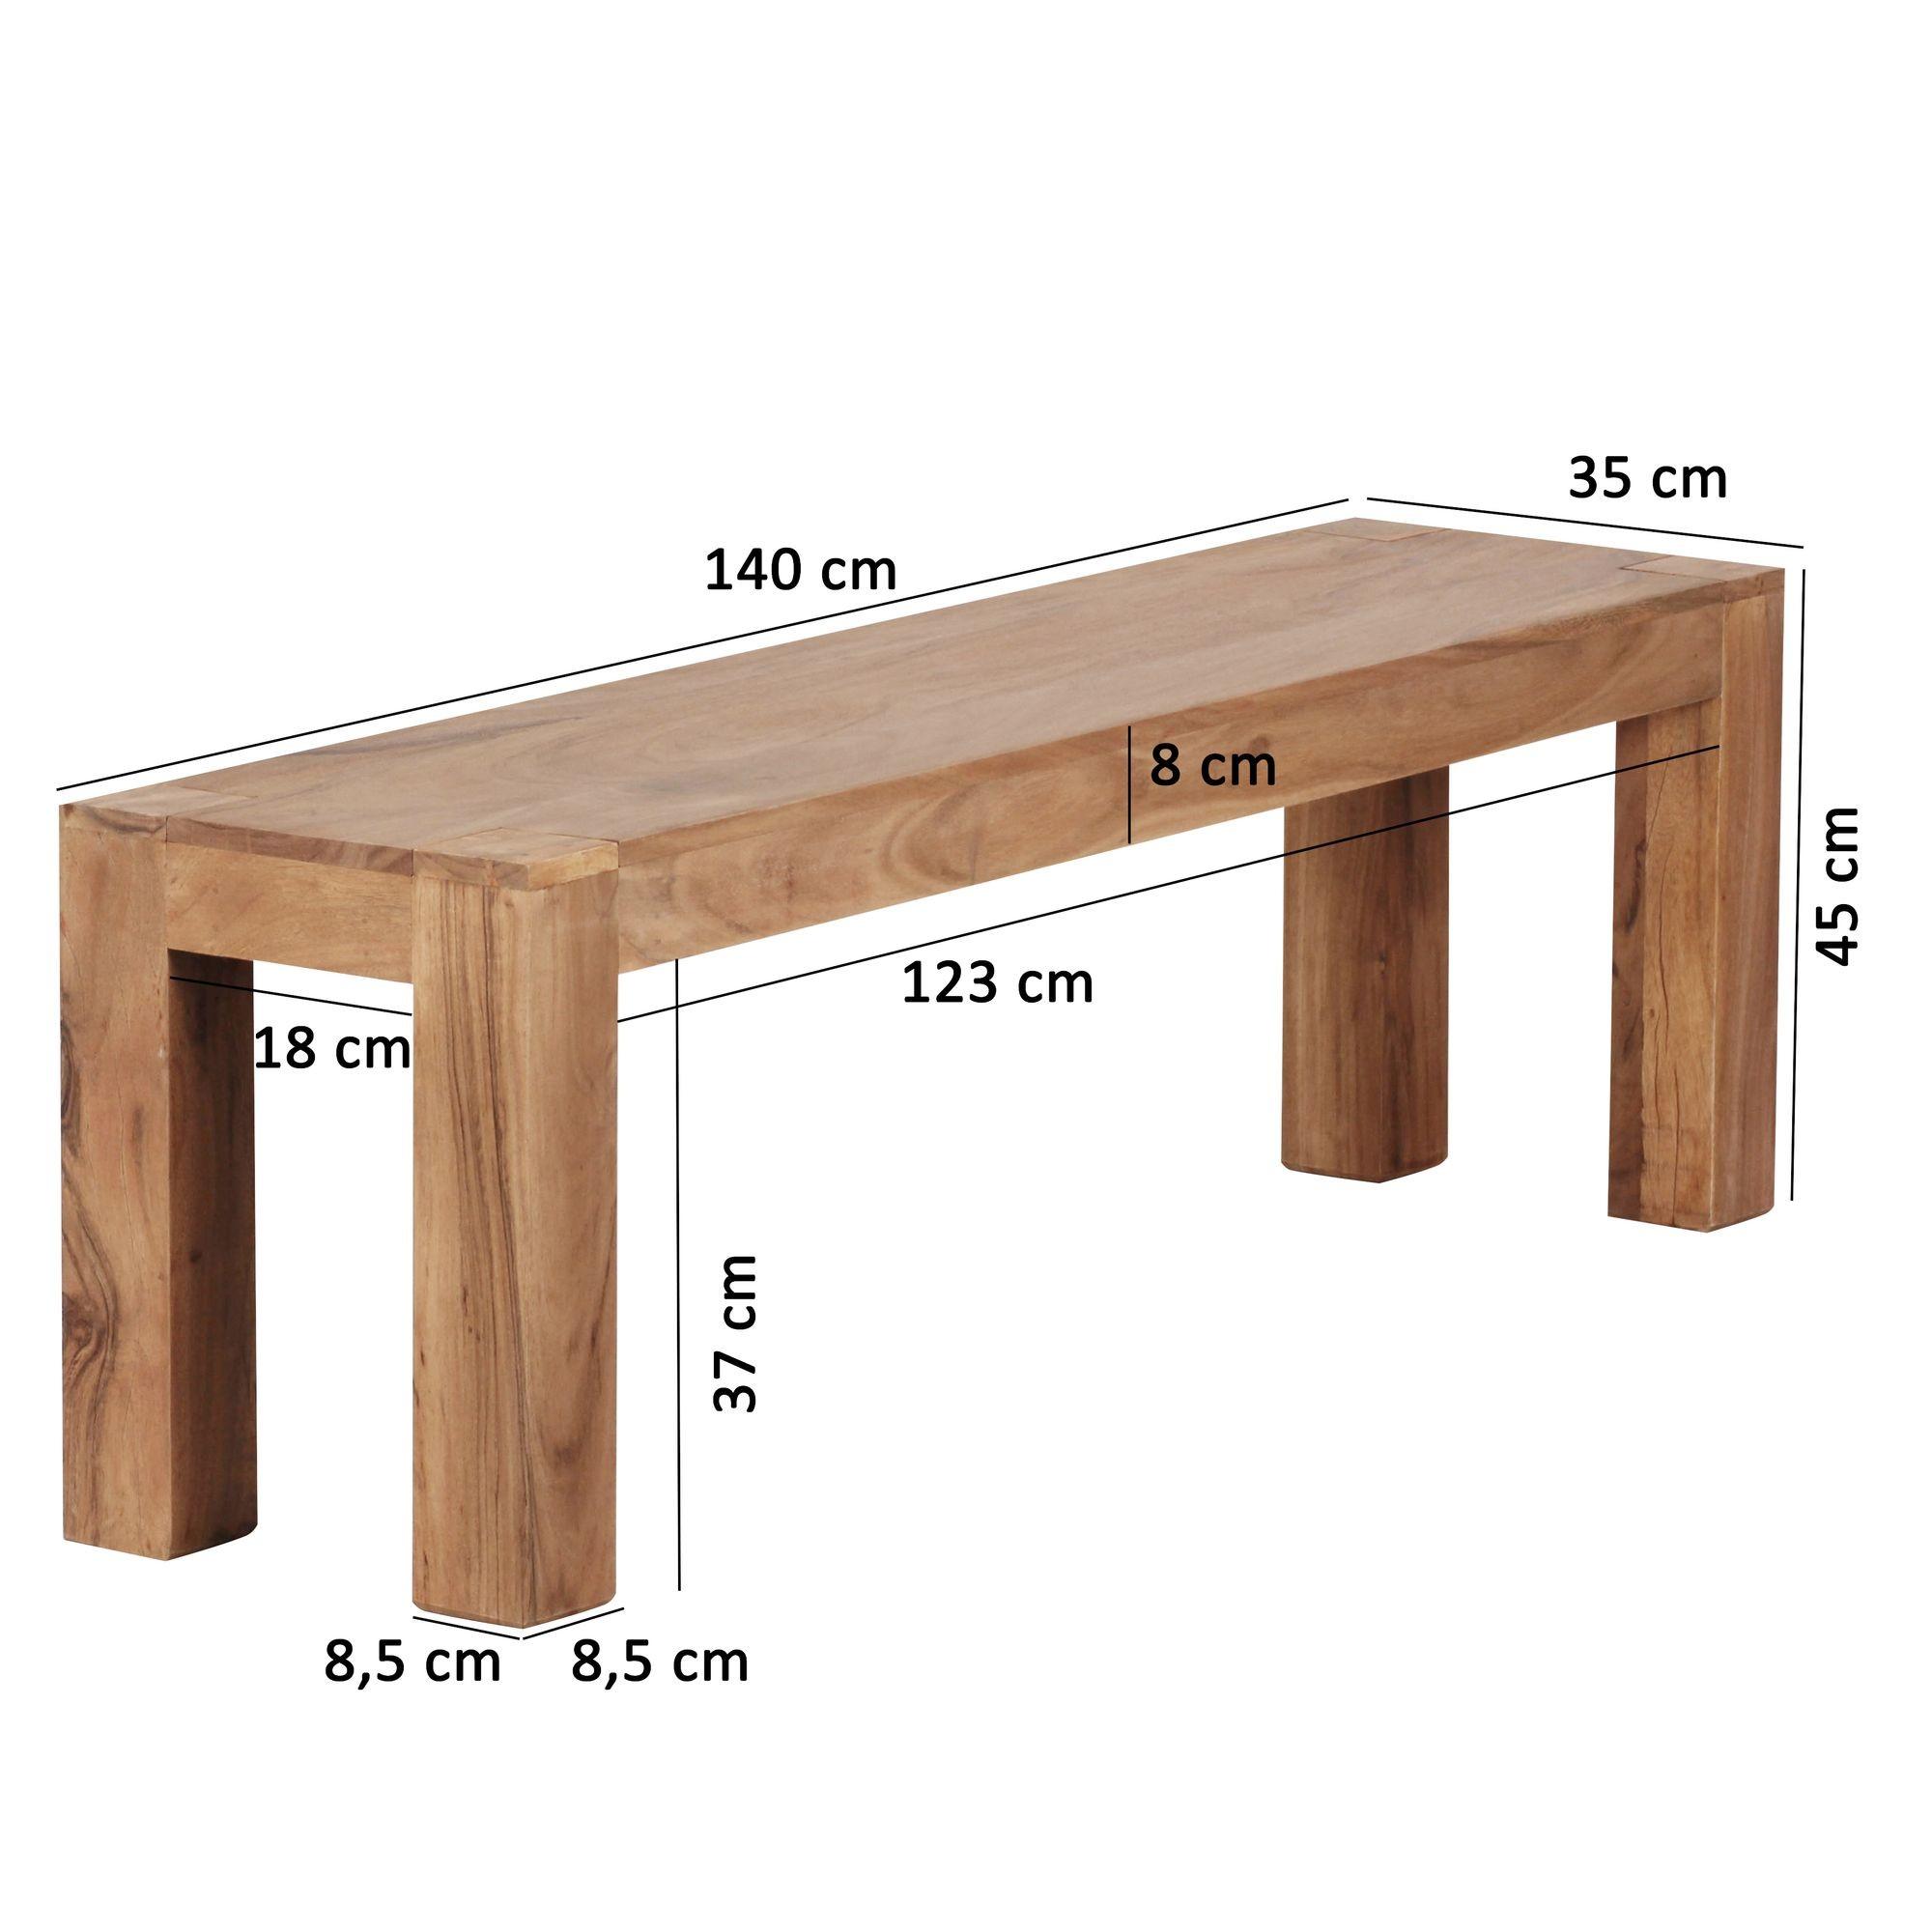 esszimmer sitzbank massiv holz akazie 140 x 45 x 35 cm. Black Bedroom Furniture Sets. Home Design Ideas